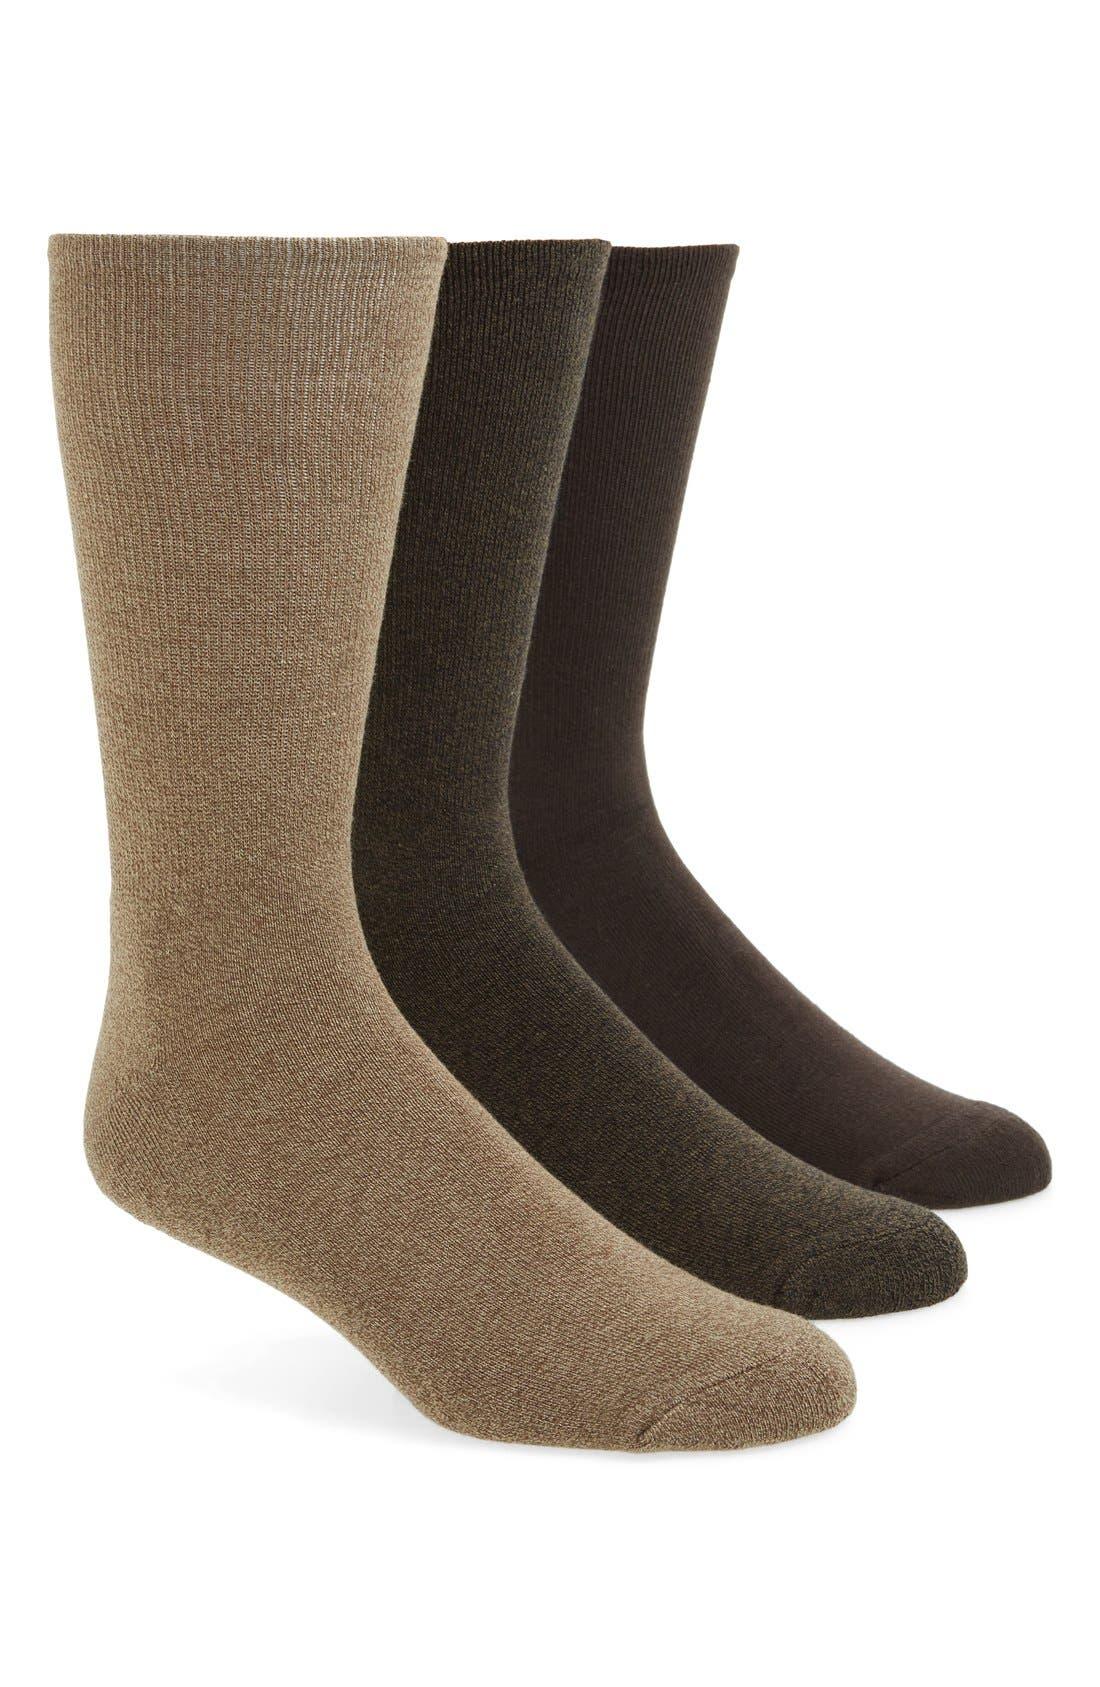 CALVIN KLEIN 3-Pack Cotton Blend Socks, Main, color, BEIGE